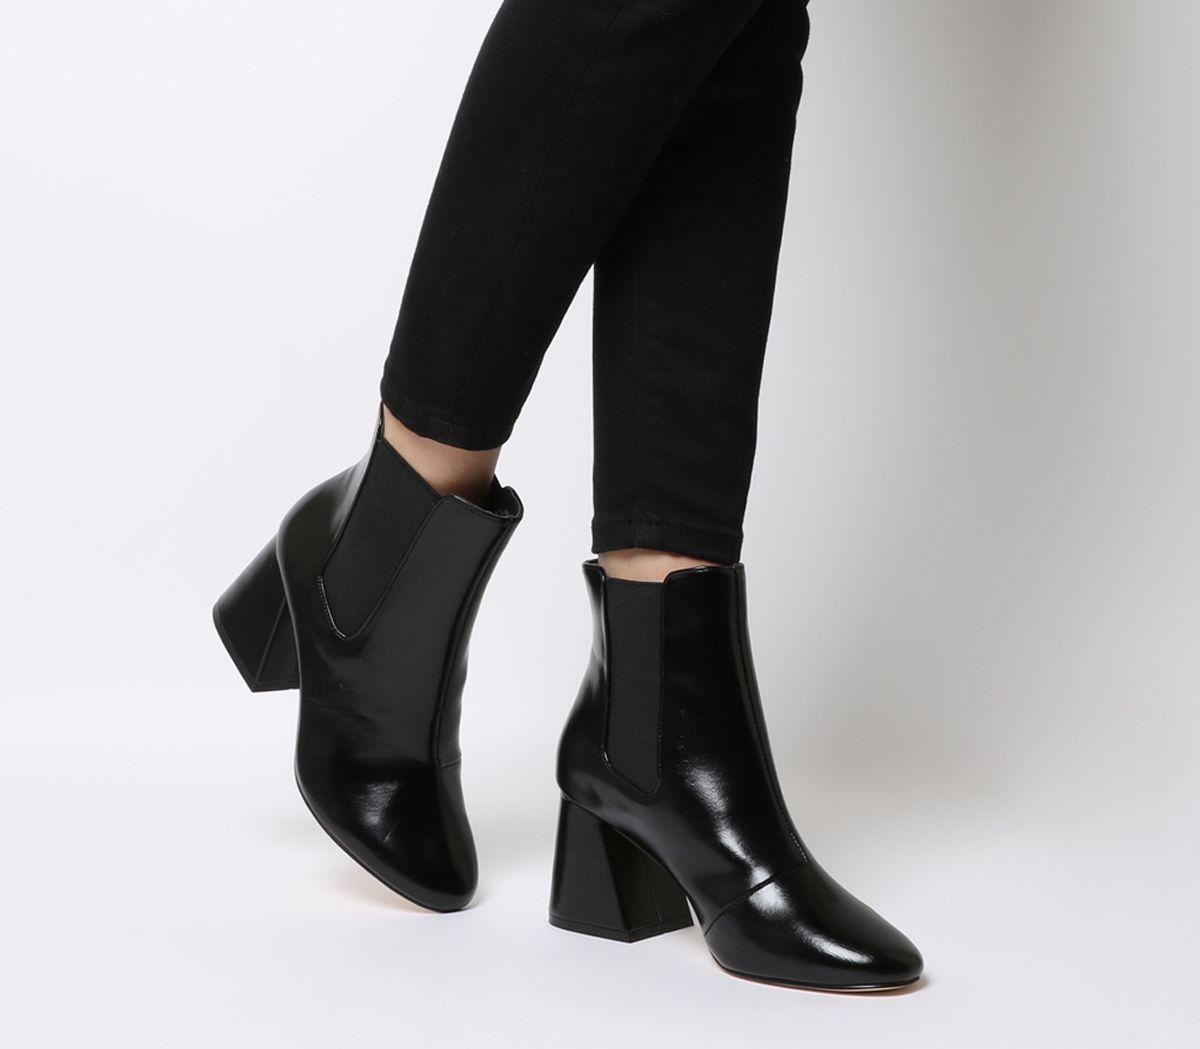 24d72fe4634 Office Angular Block Heel Chelsea Boots Black - Womens Chelsea Boots